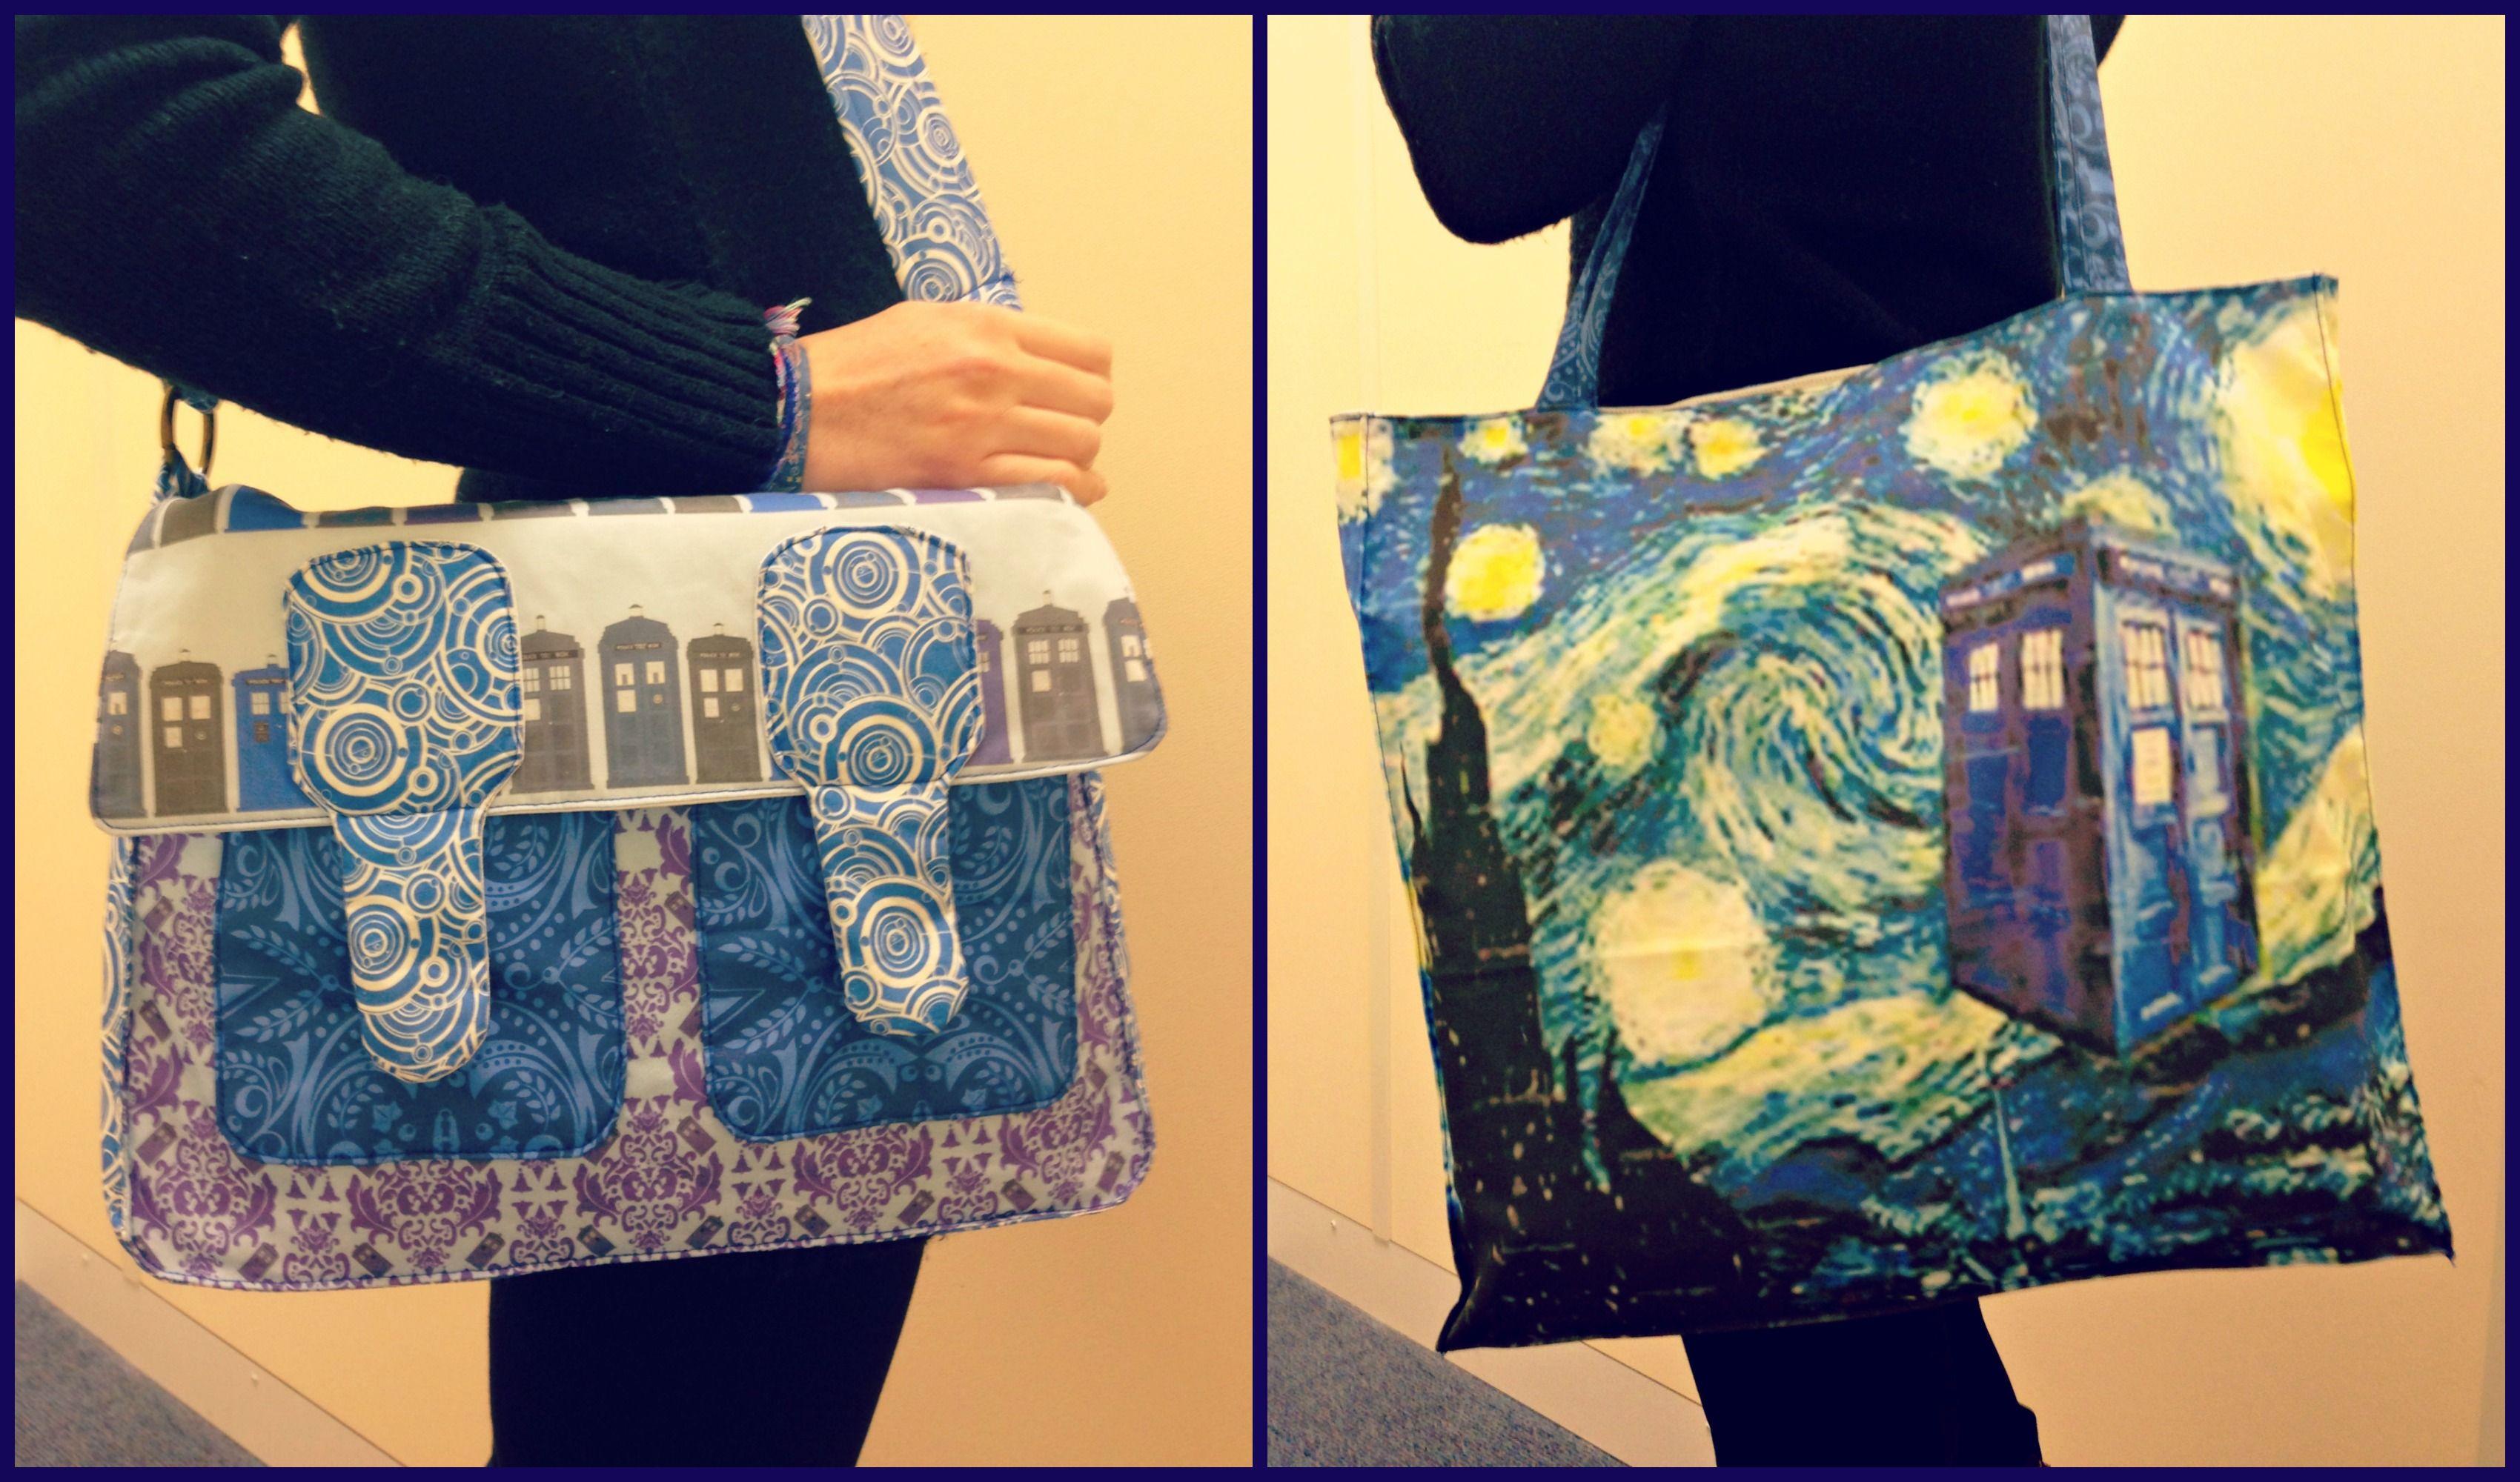 Free designer bags giveaways